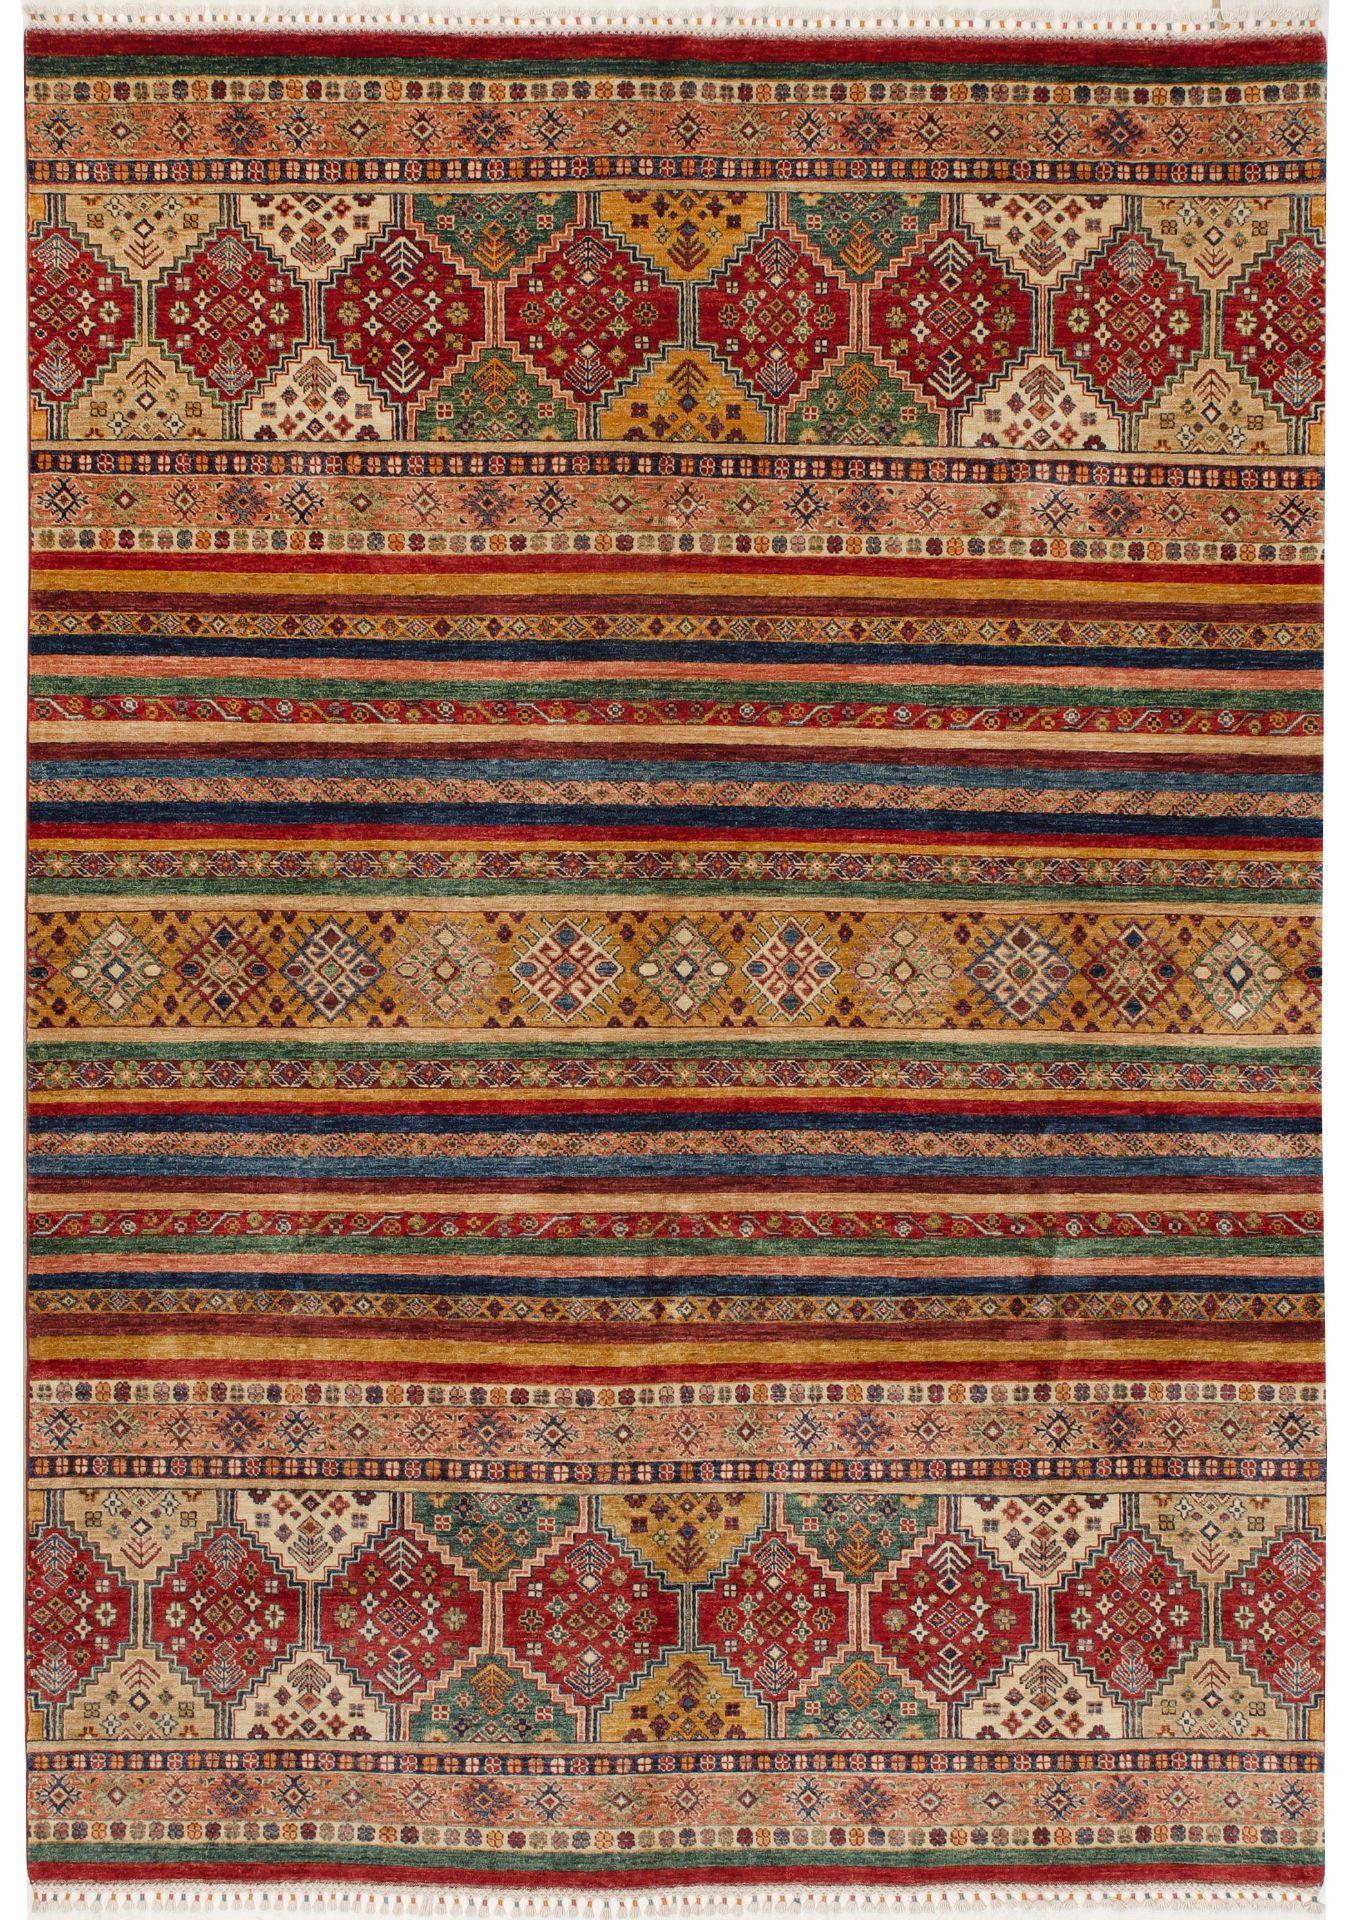 Großer Afghan-Streifenteppich